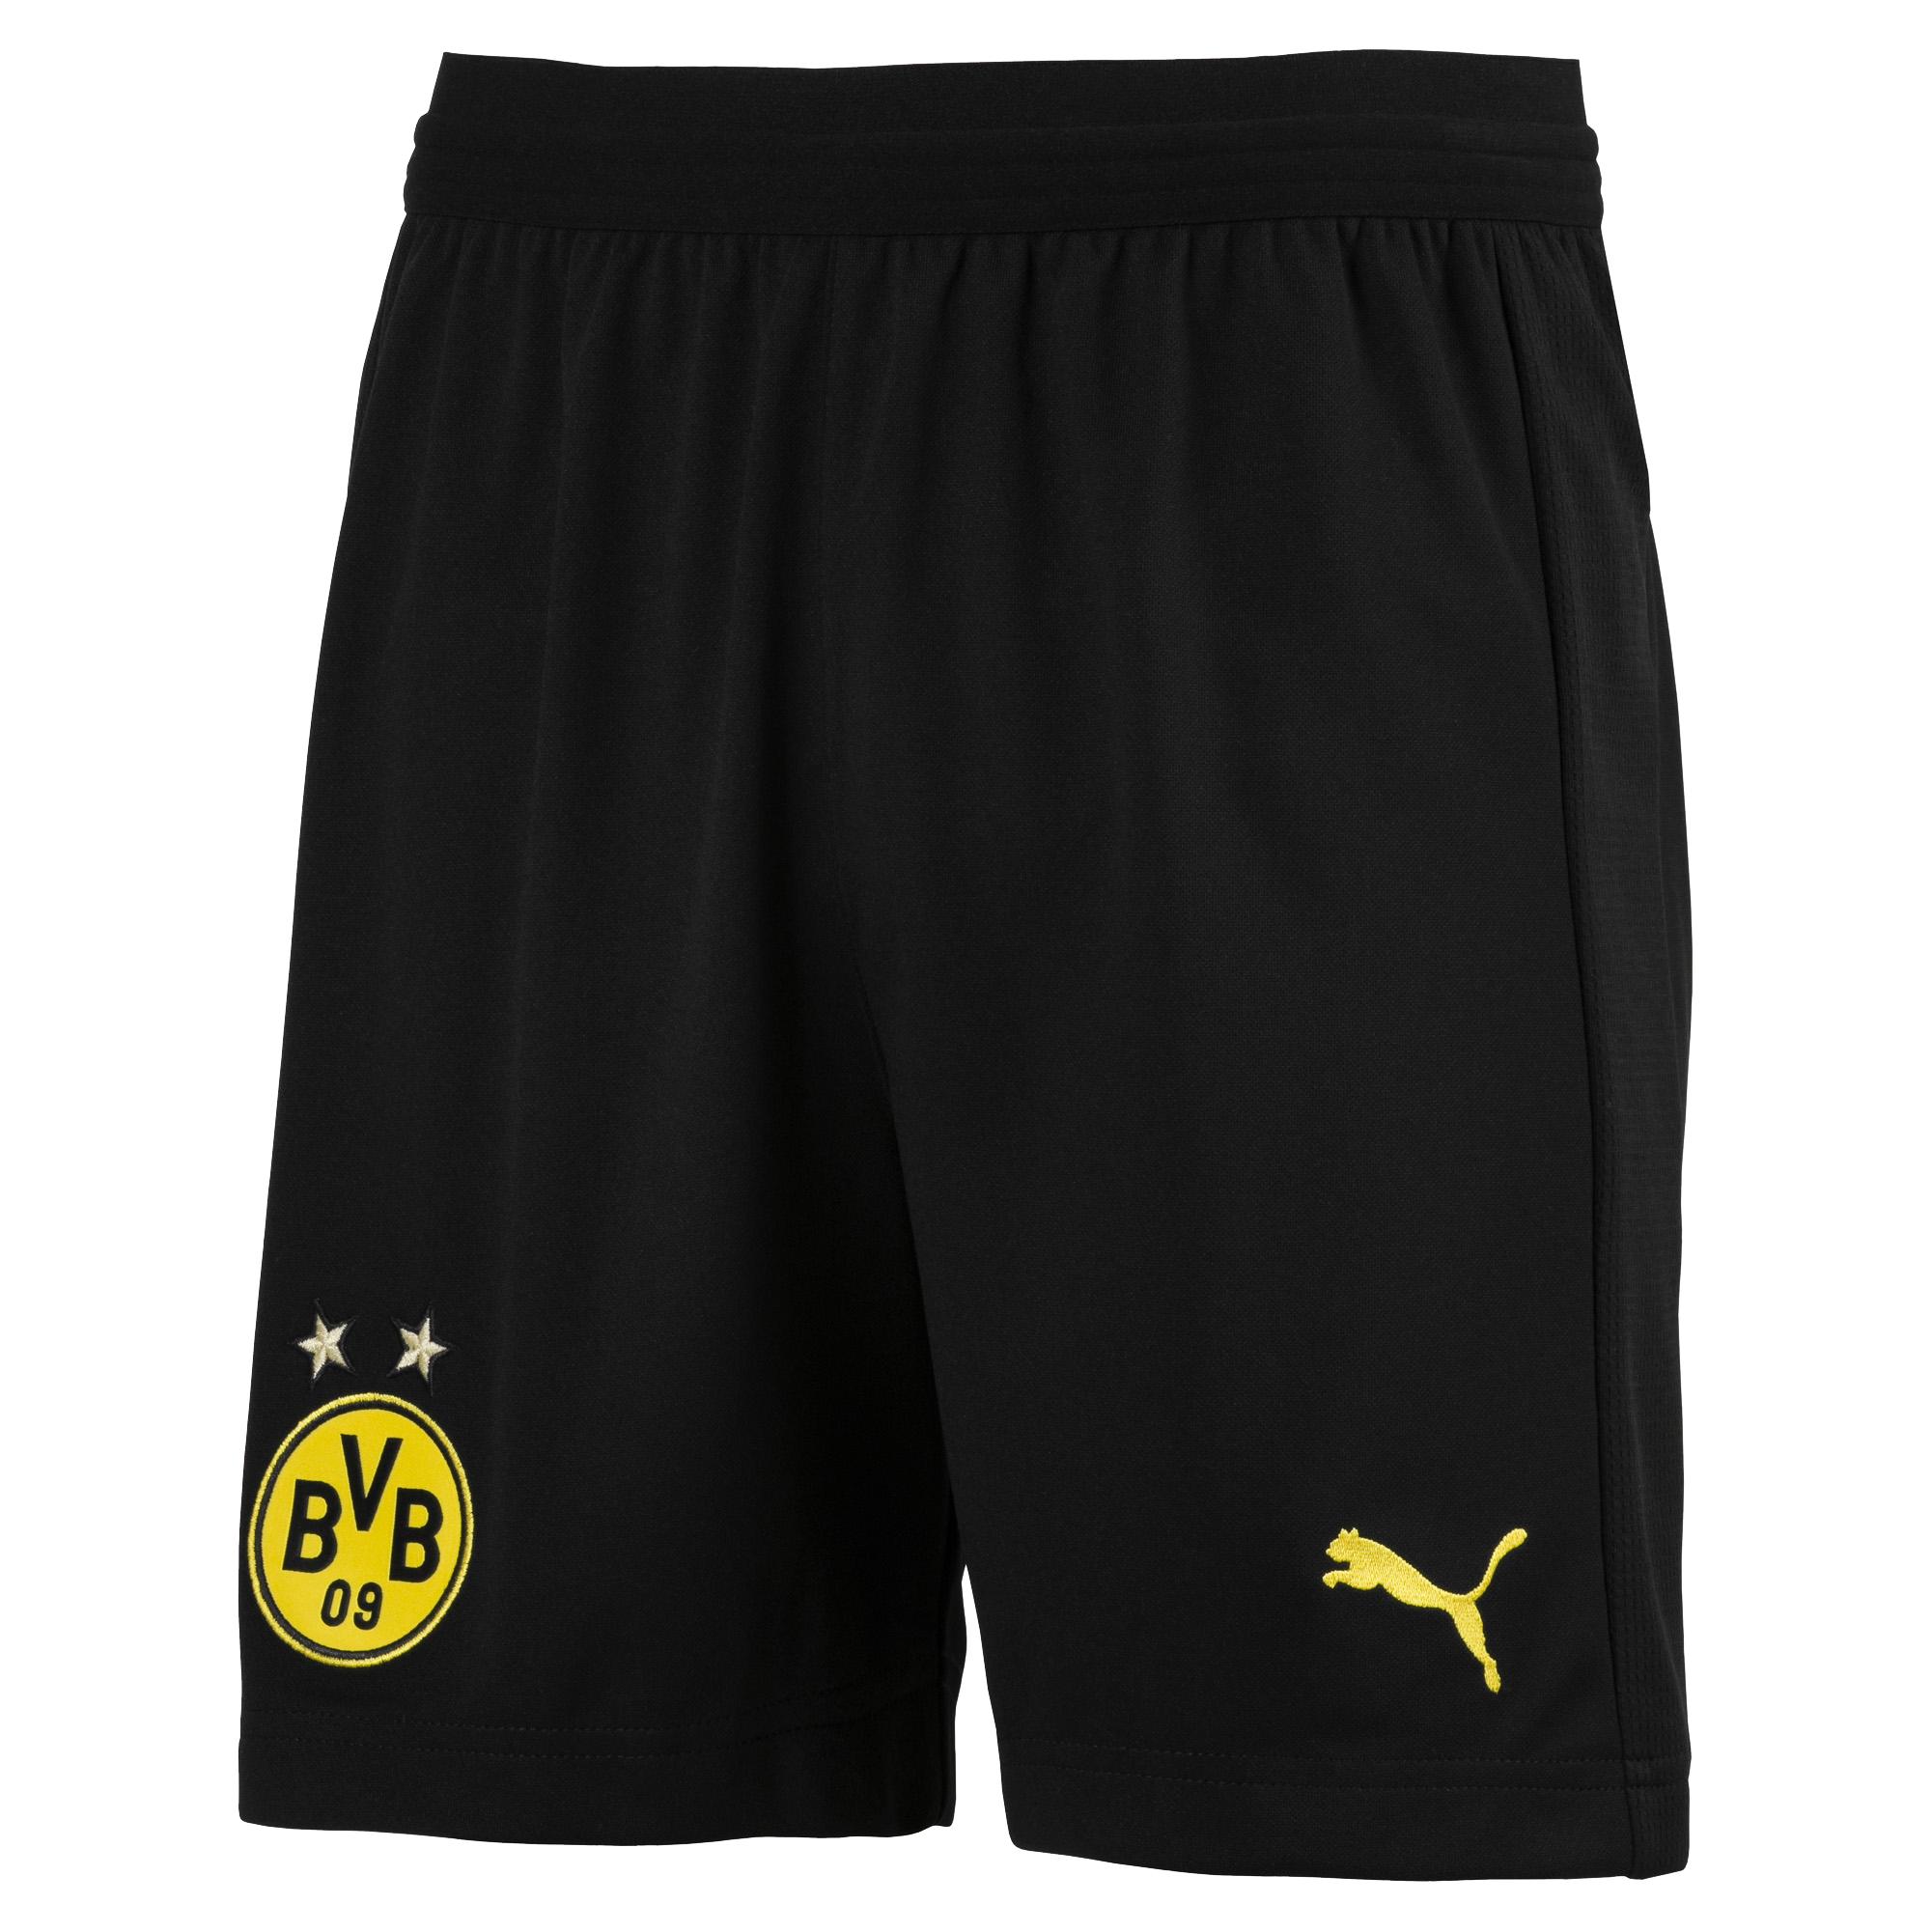 Puma BVB Borussia Dortmund -Kinder Heim Short 18/19 für nur 2€ @ Sport1a